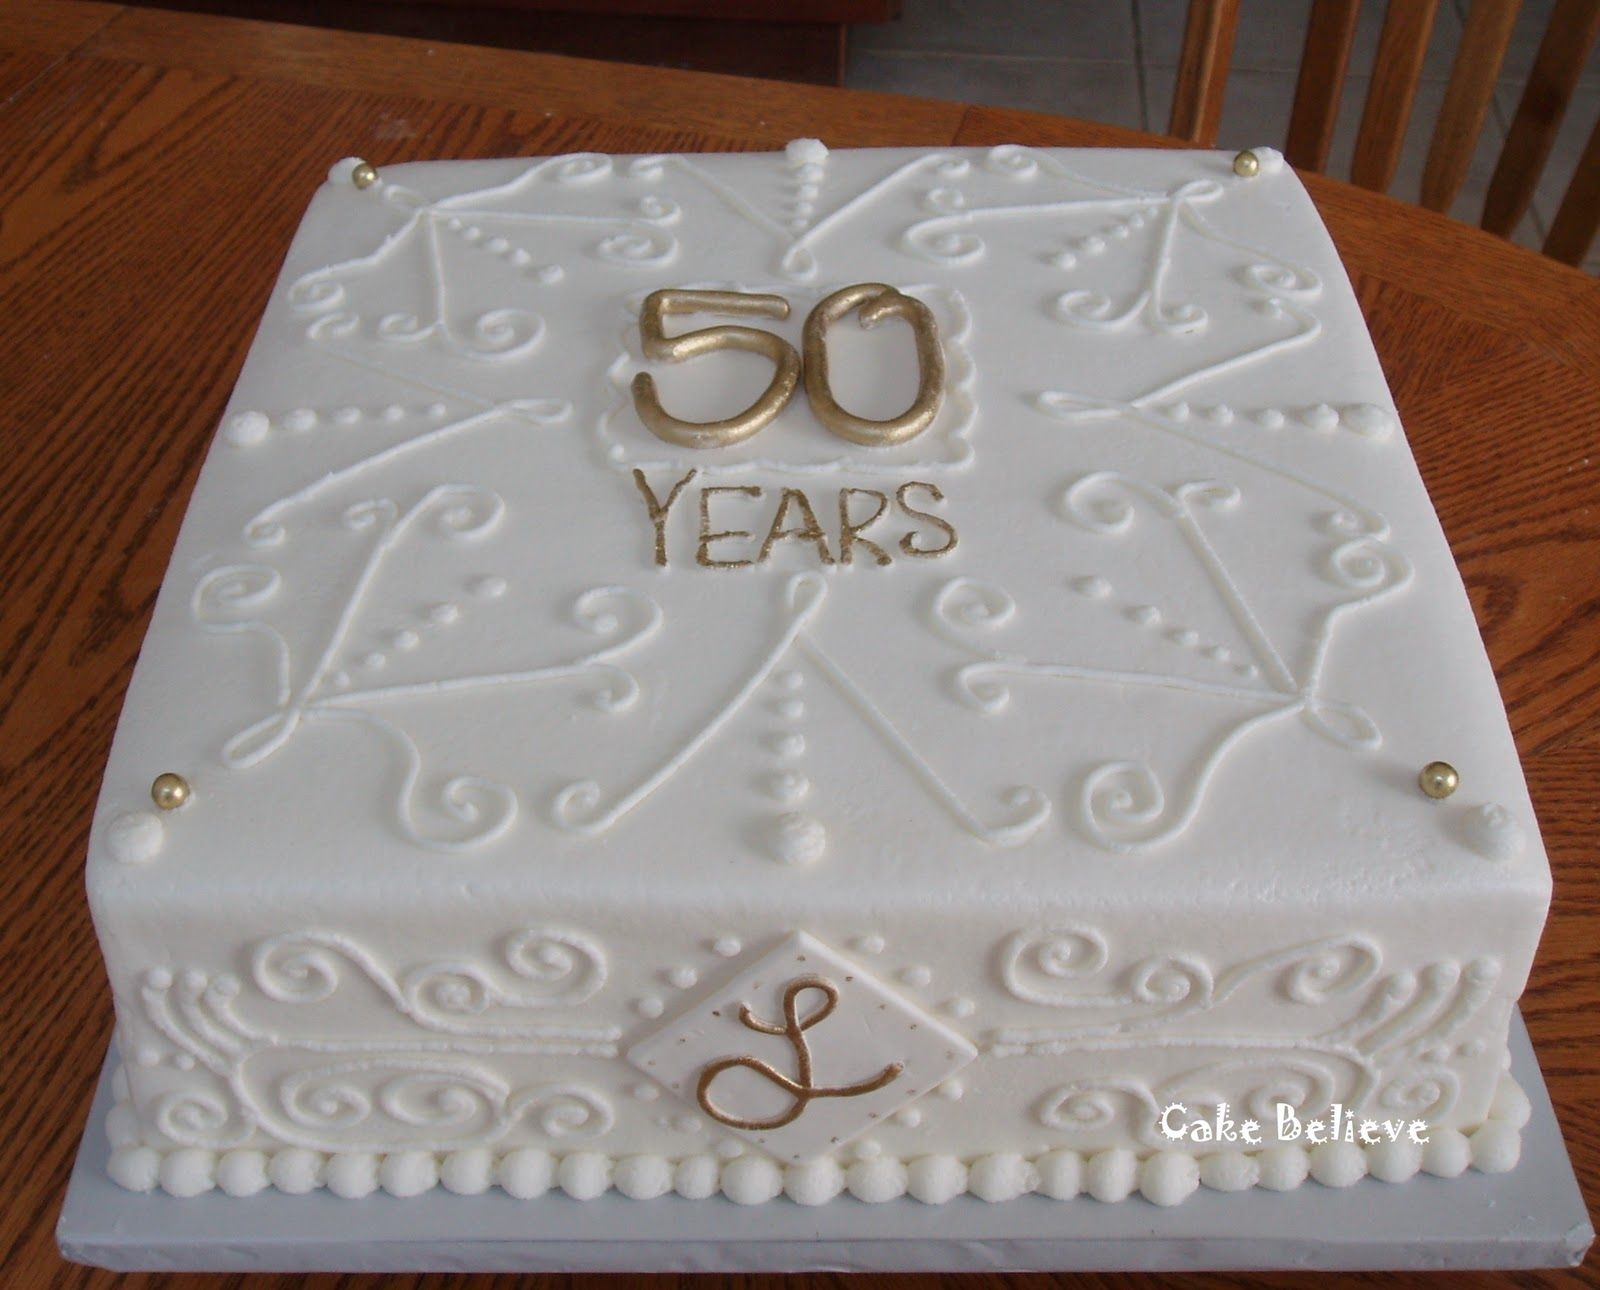 50th Anniversary Cakes Ideas 50th Anniversary Cakes Ideas Jpg - 50th wedding anniversary cakes